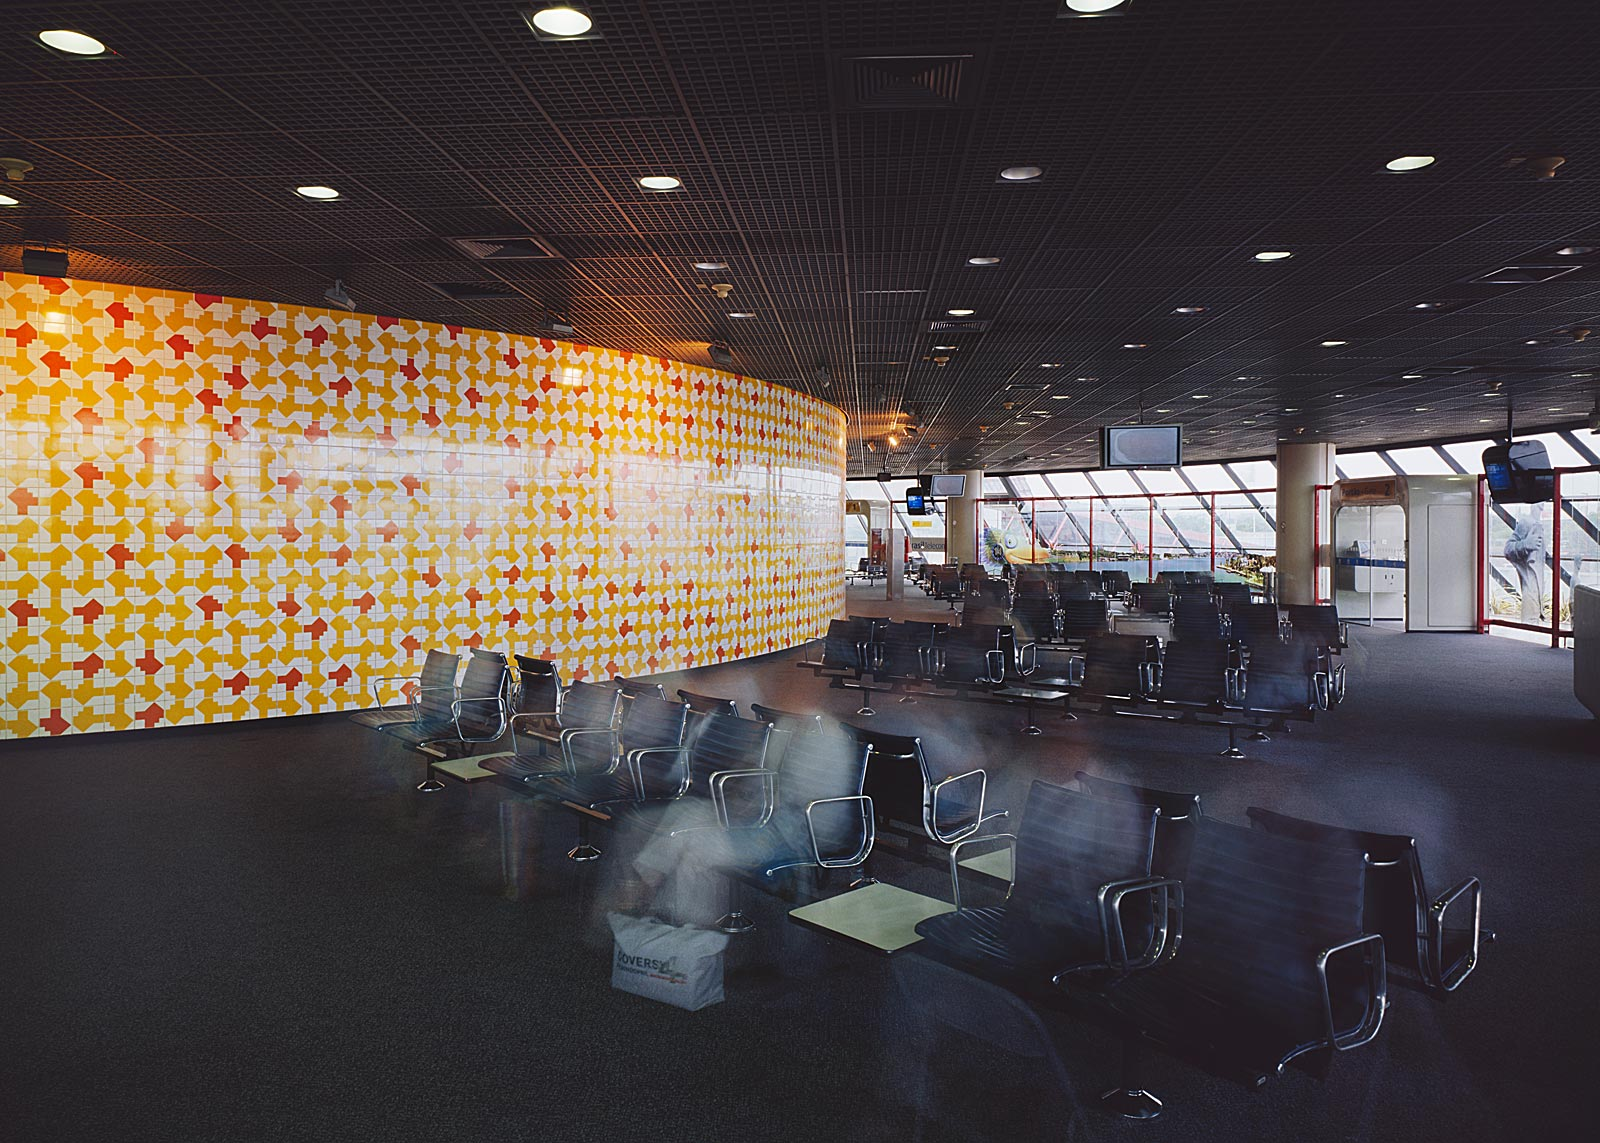 Aeroporto Internacional Presidente Juscelino Kubitschek, Brasilia